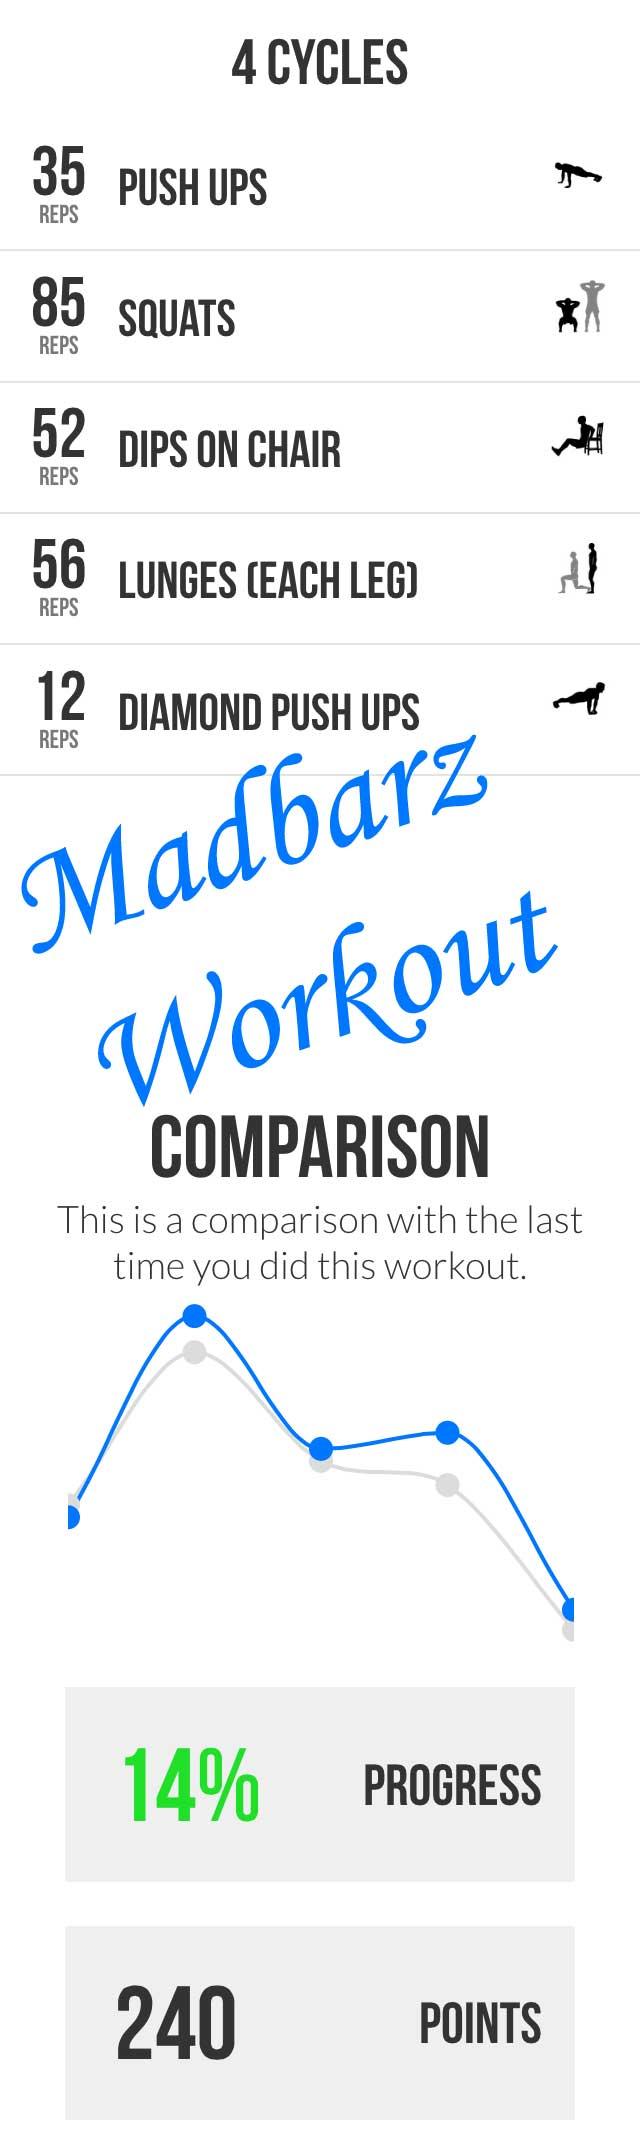 Madbarz Workout : madbarz, workout, Madbarz, Challenge, Street, Workout,, Workout, Apps,